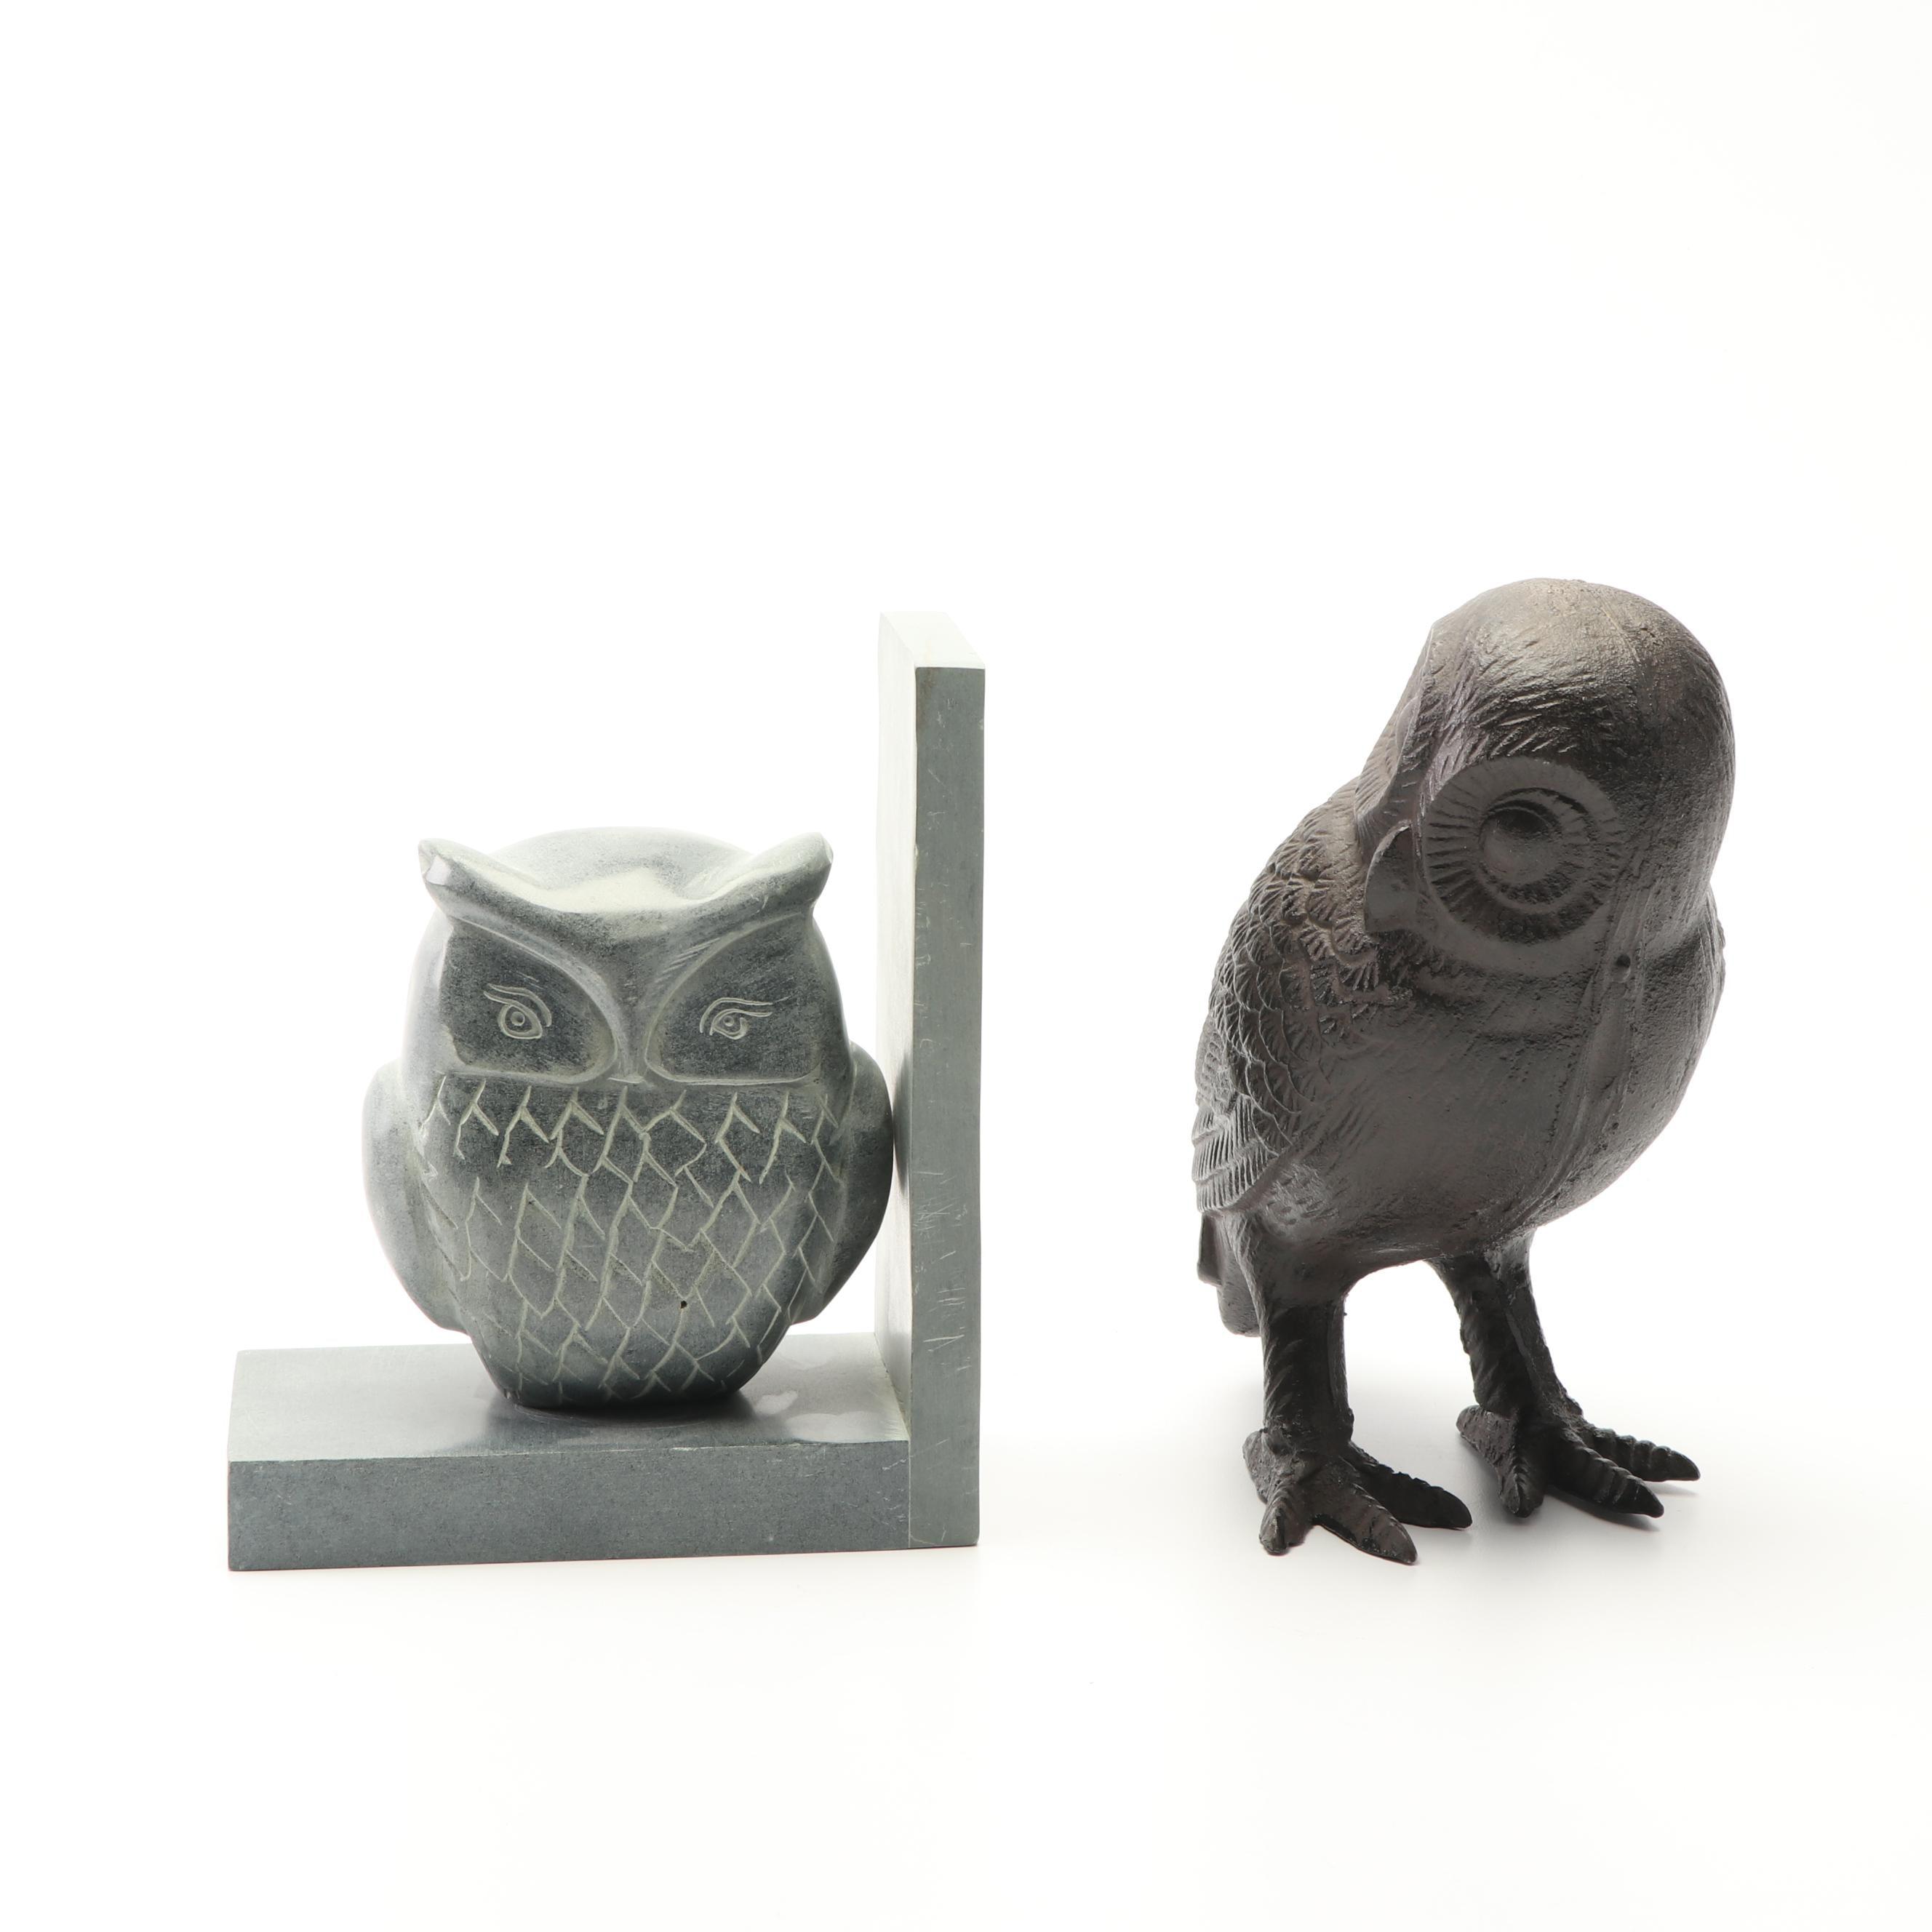 Soapstone Owl Bookend and Cast Iron Owl Figurine